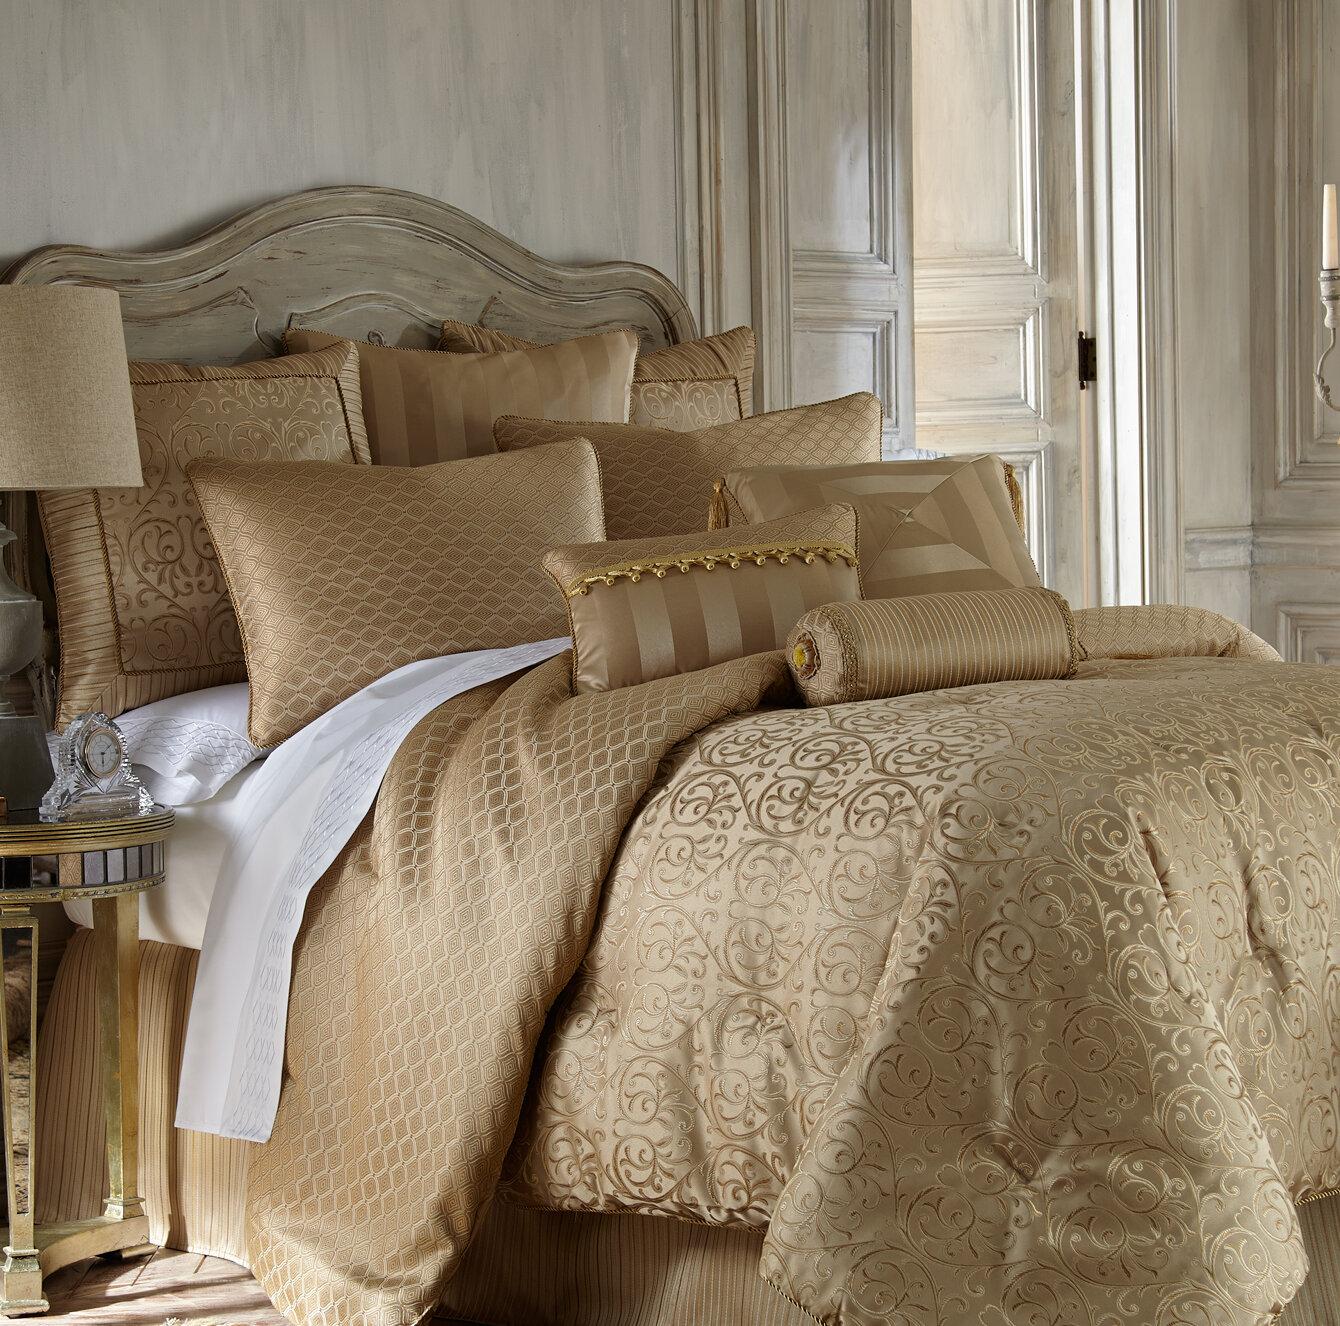 Waterford Bedding Anya 4 Piece Reversible Comforter Set & Reviews ...